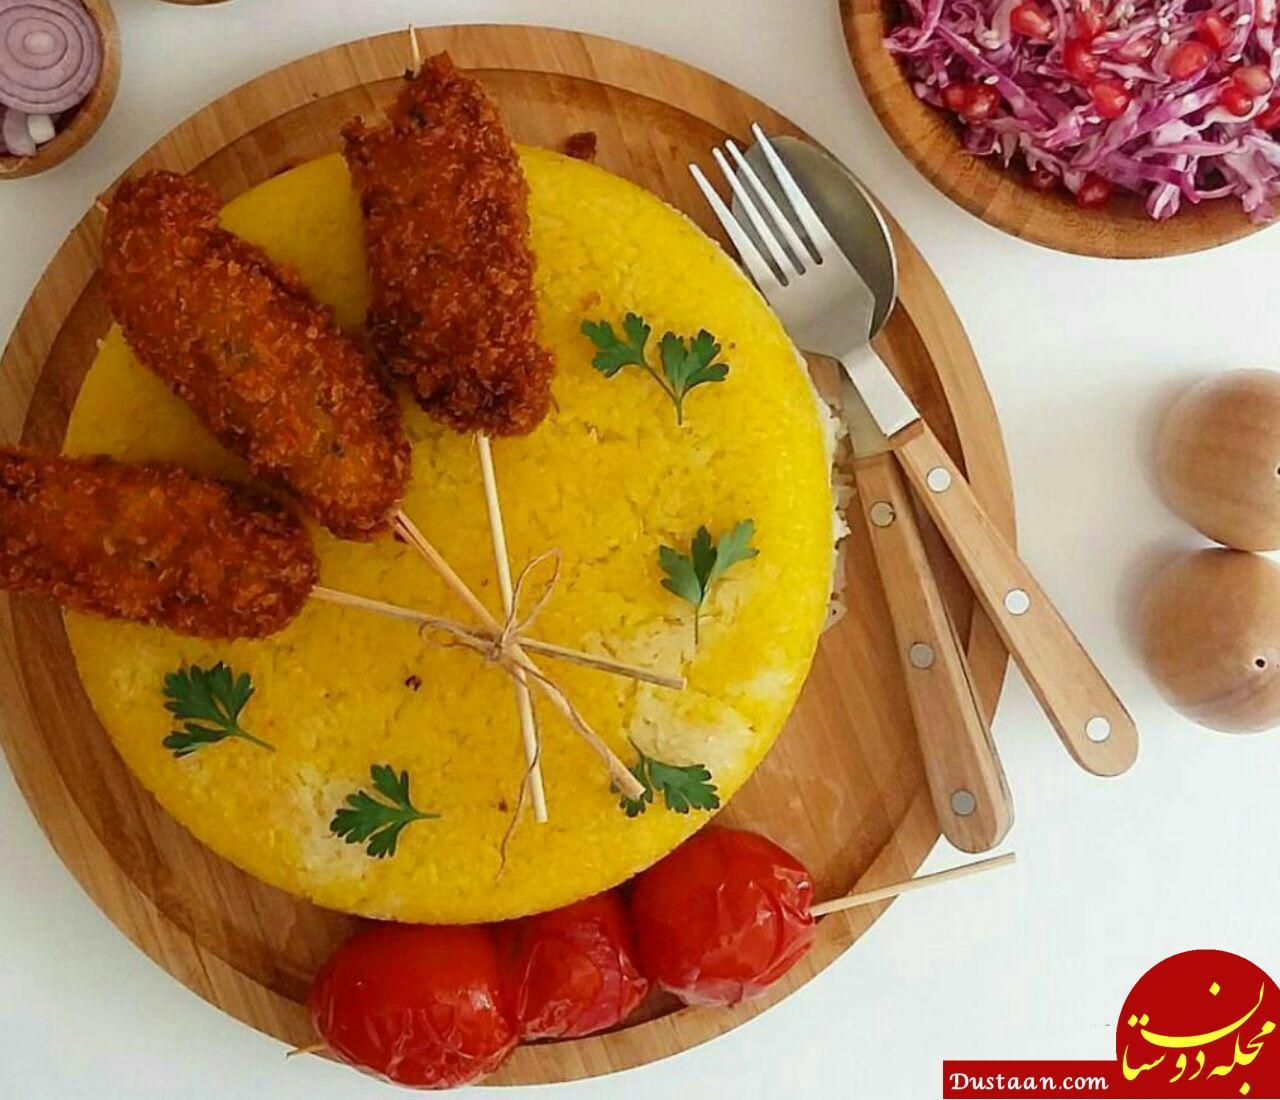 www.dustaan.com طرز تهیه کباب چوبی استانبولی به سبکی خوشمزه